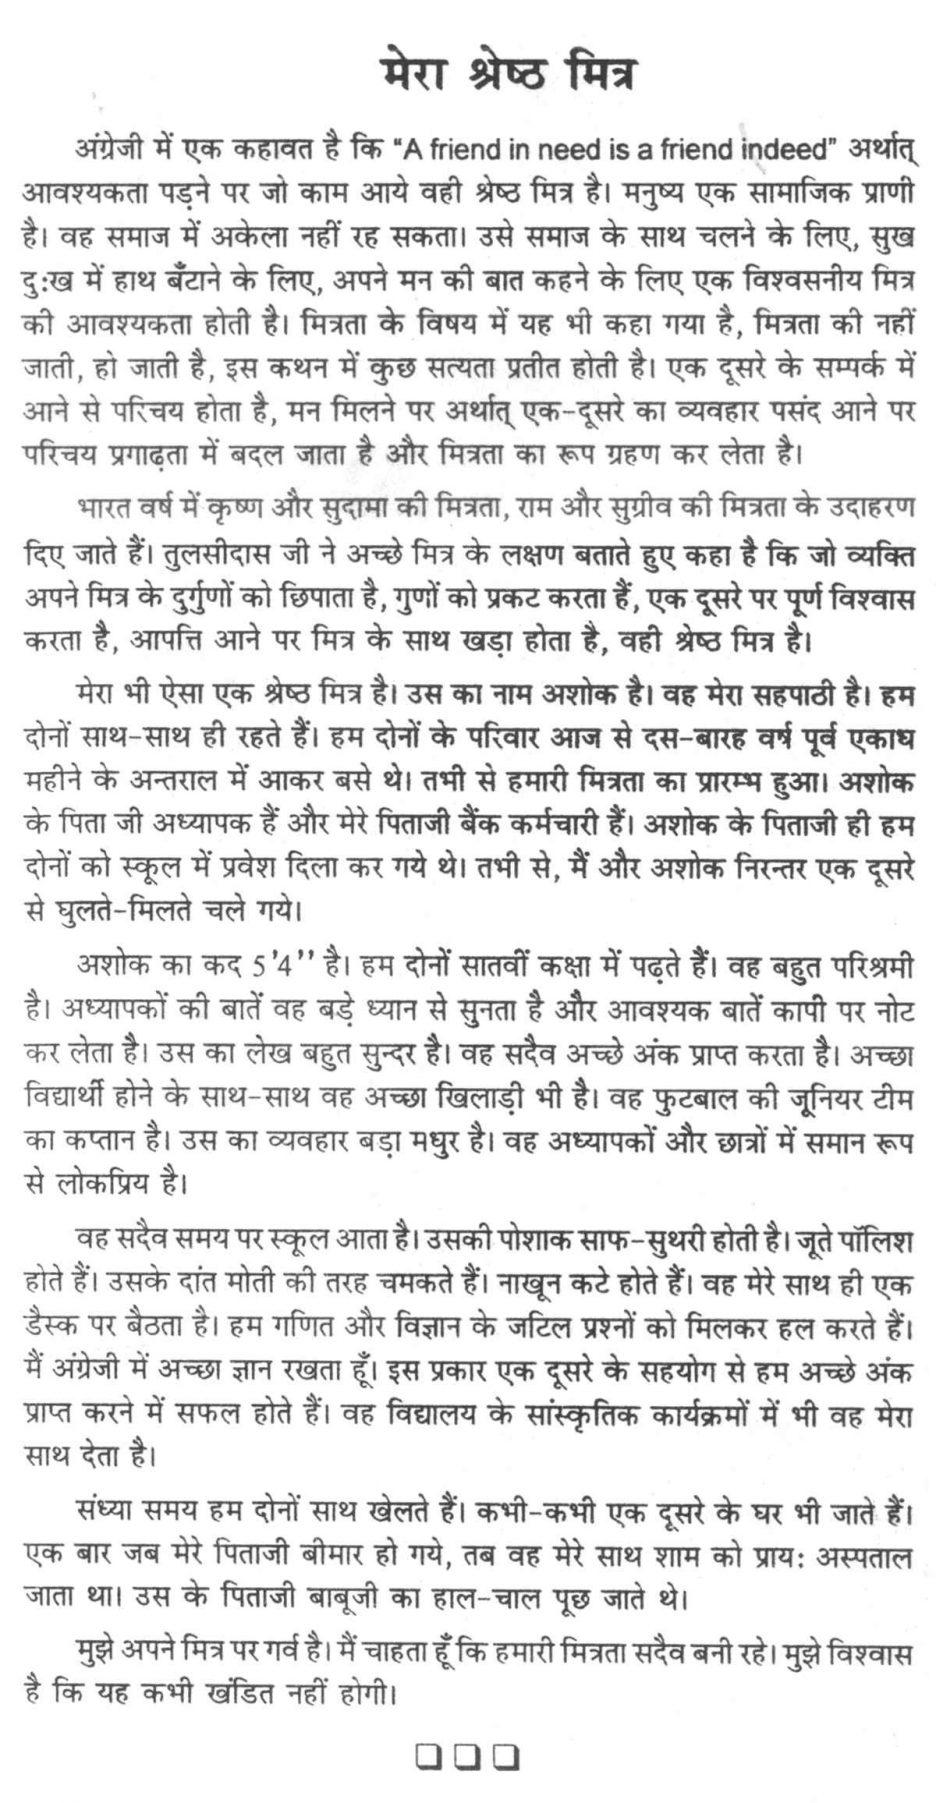 001 Essay Example Qualities Of Good Friend Thumb Teacher Great Characteristics Pdf In Hindi Three Free Language Urdu Exceptional A Short Full